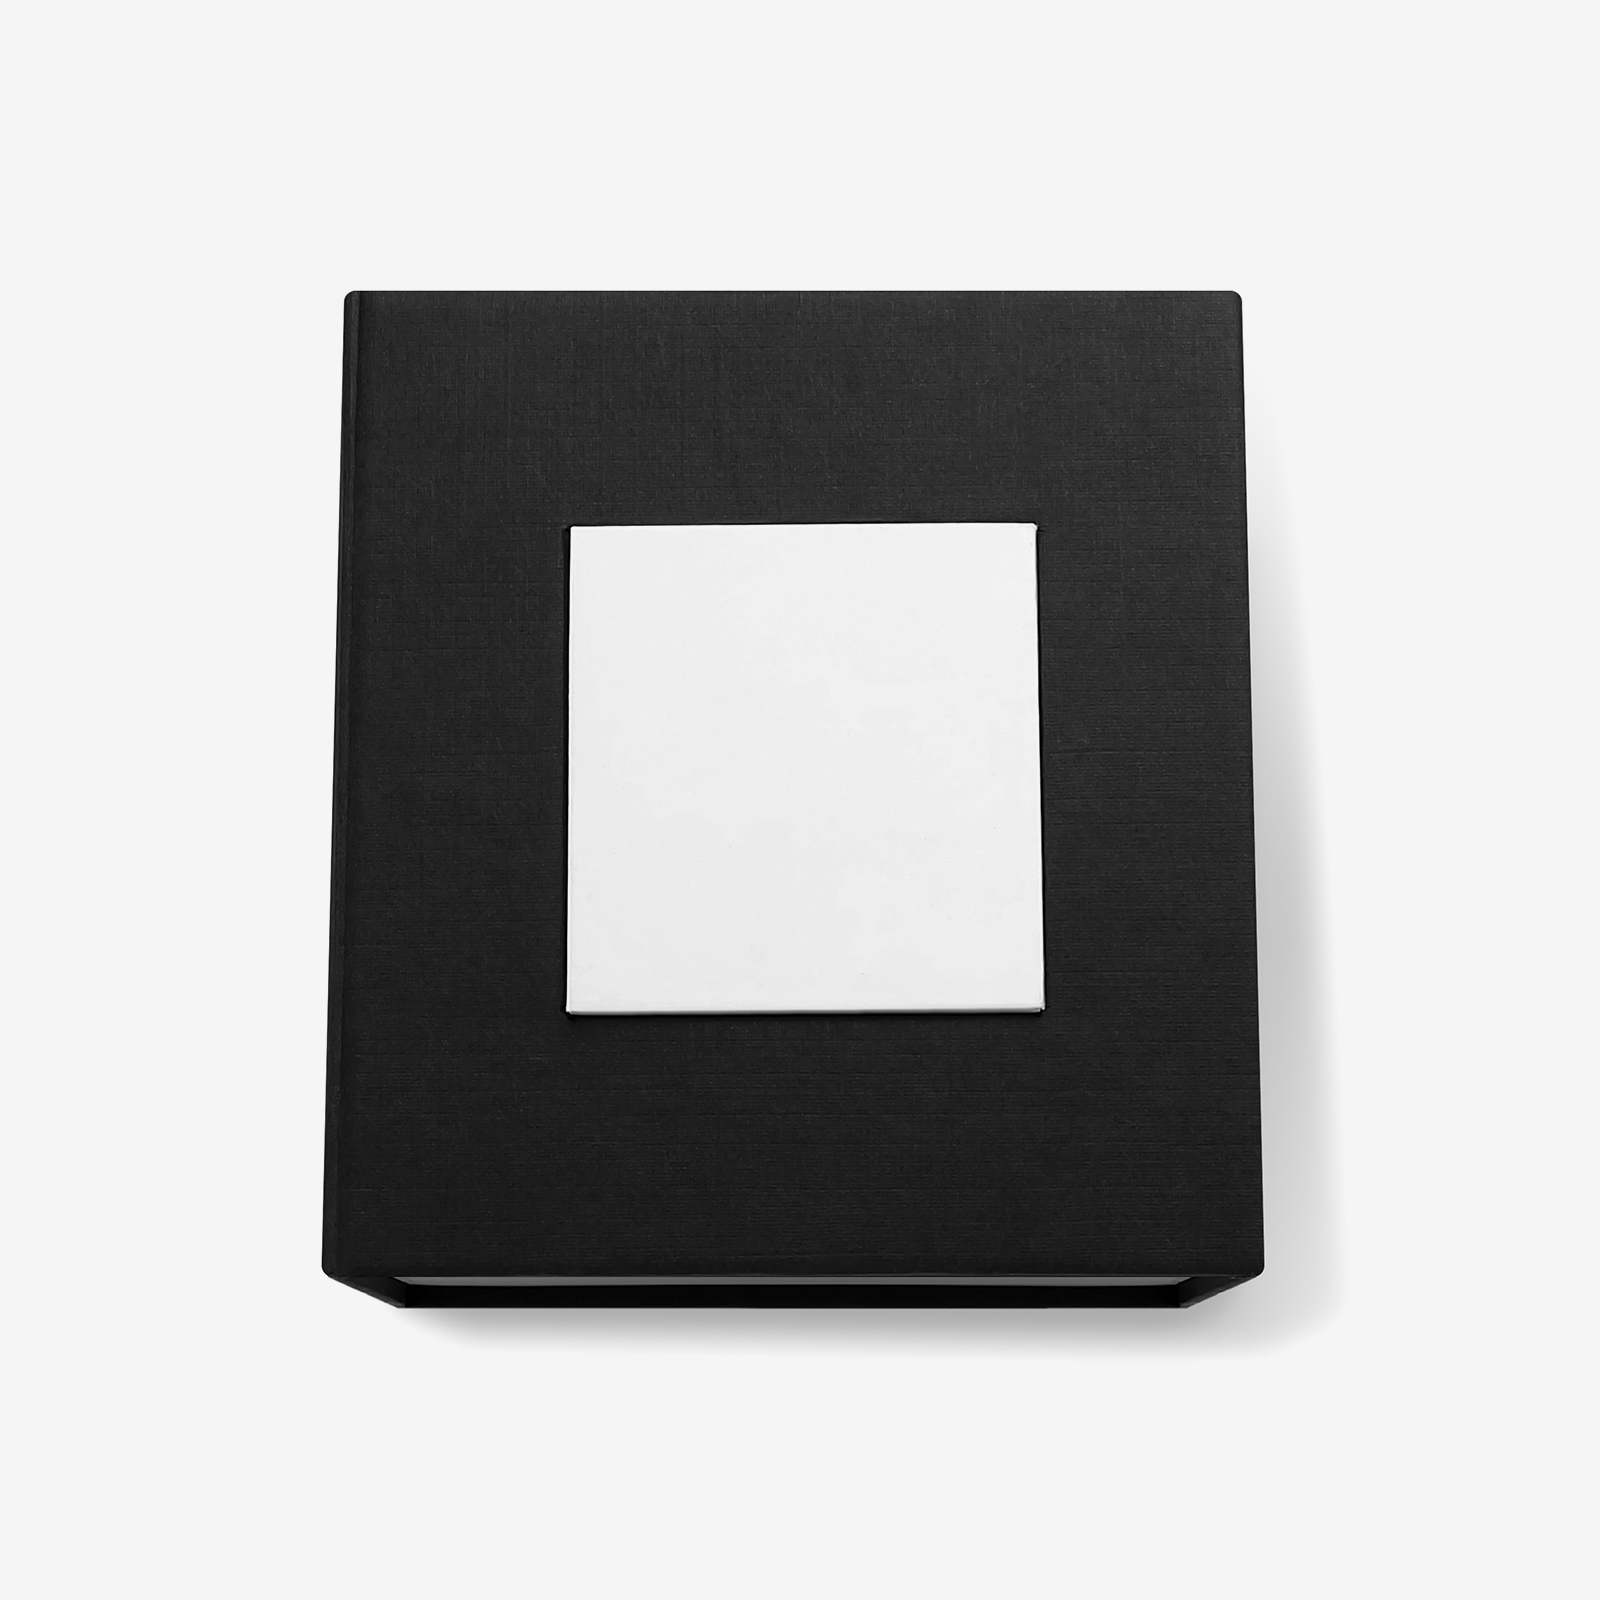 box product photo